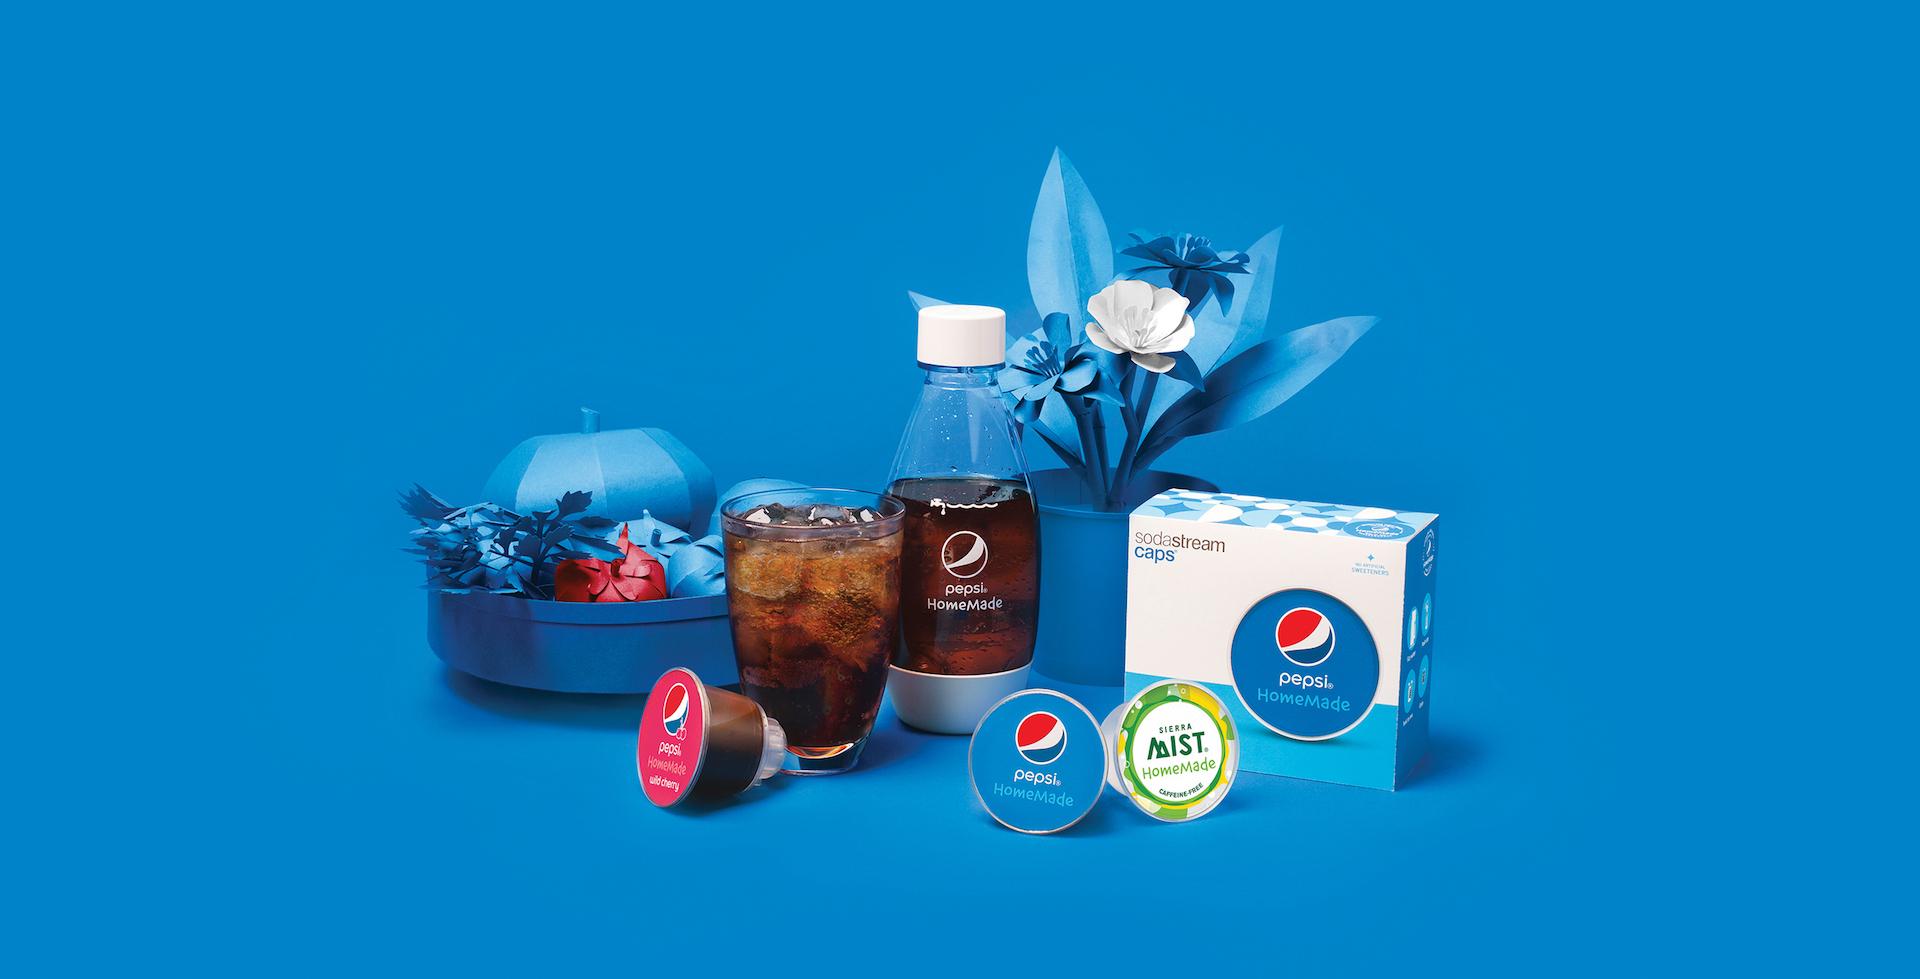 Speciální edice Pepsi ve spolupráci se SodaStream z roku 2015